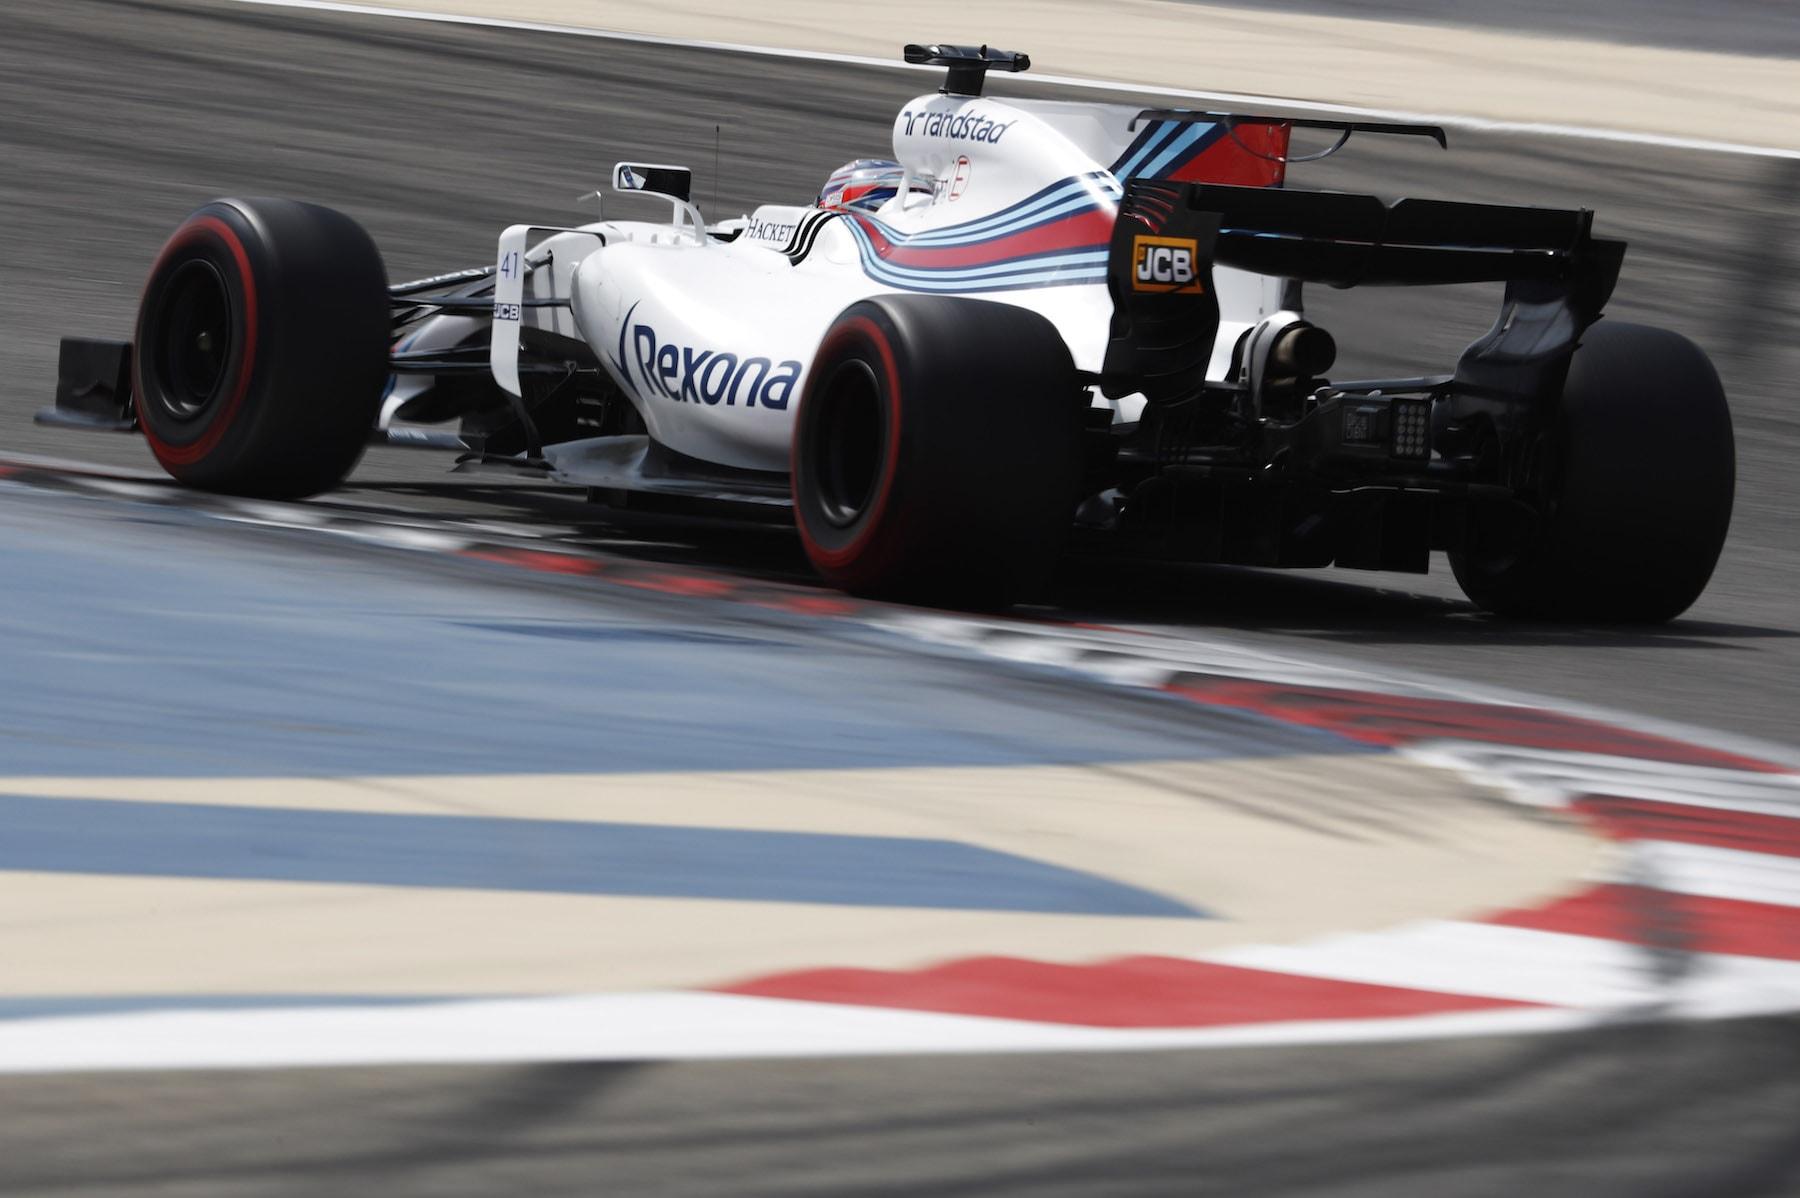 2017 Gary Paffett | Williams FW40 | 2017 Bahrain Test 2 copy.jpg